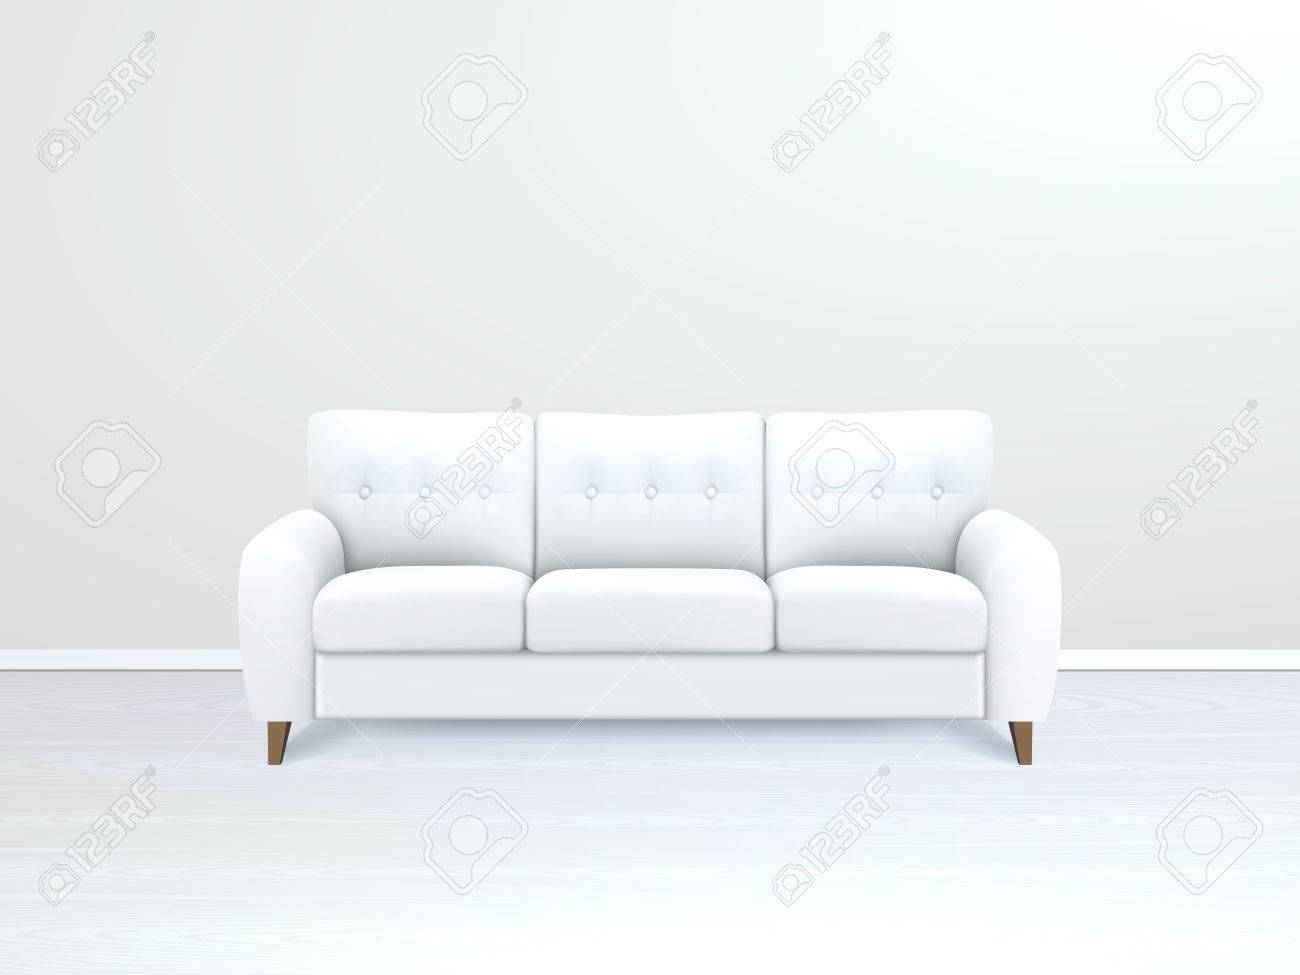 White Soft Luxury Leather Sofa In Modern Apartment Salon Art ...